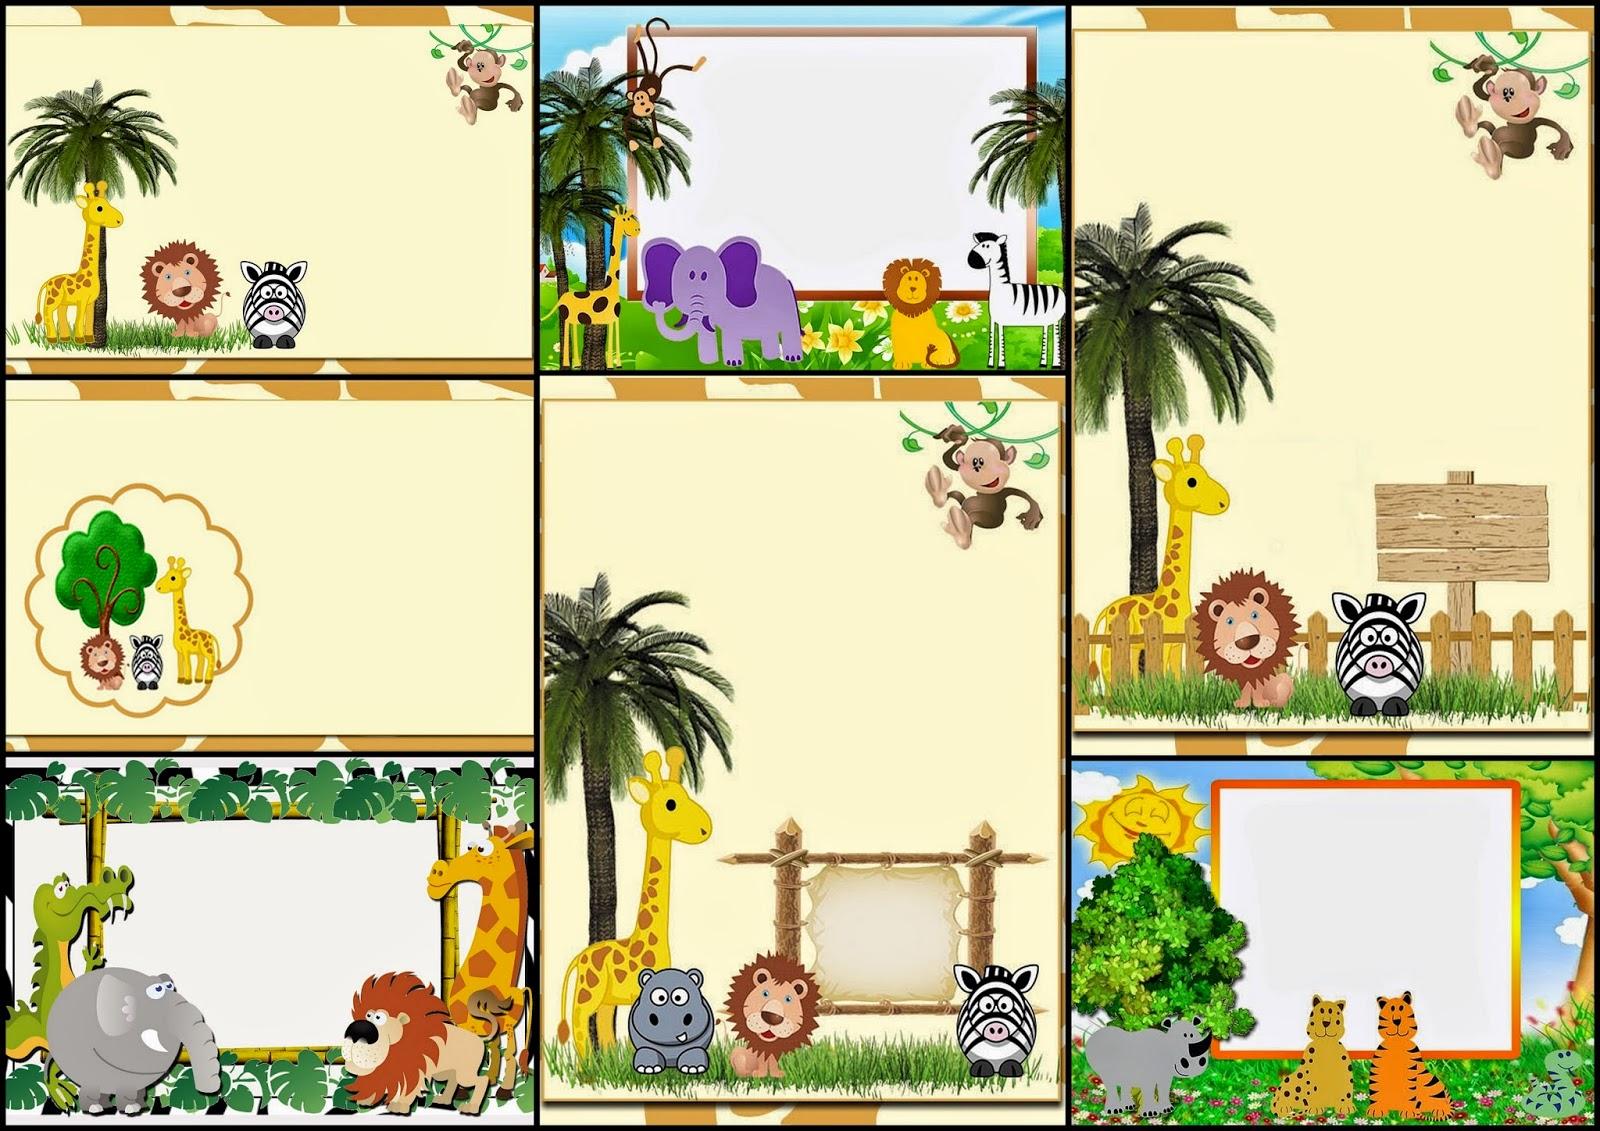 imagenes de animales de la selva para imprimir - Recursos Tic Infantil animales Recursos Tic Infantil home